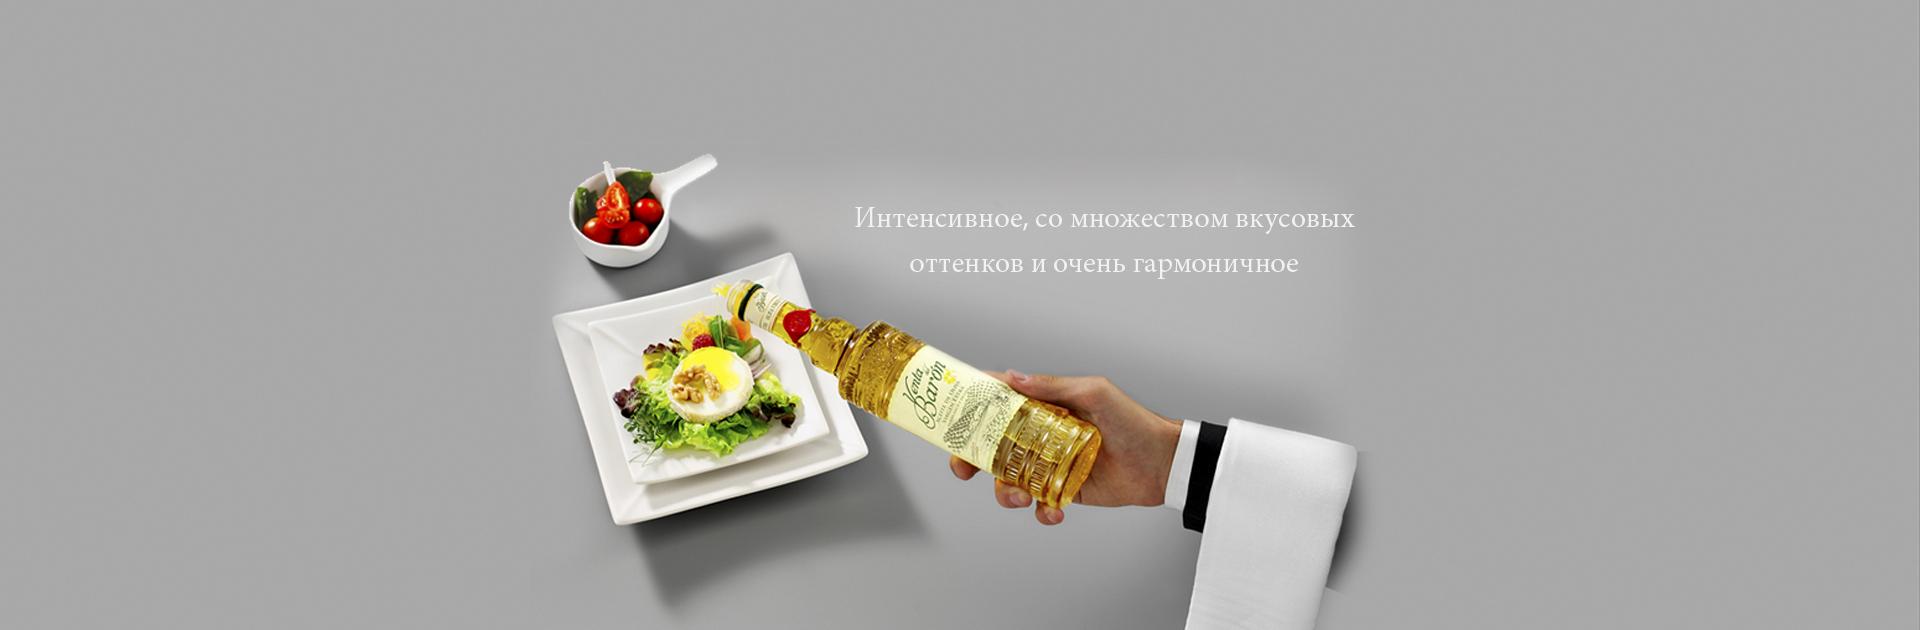 banner-venta-baron-ruso-3